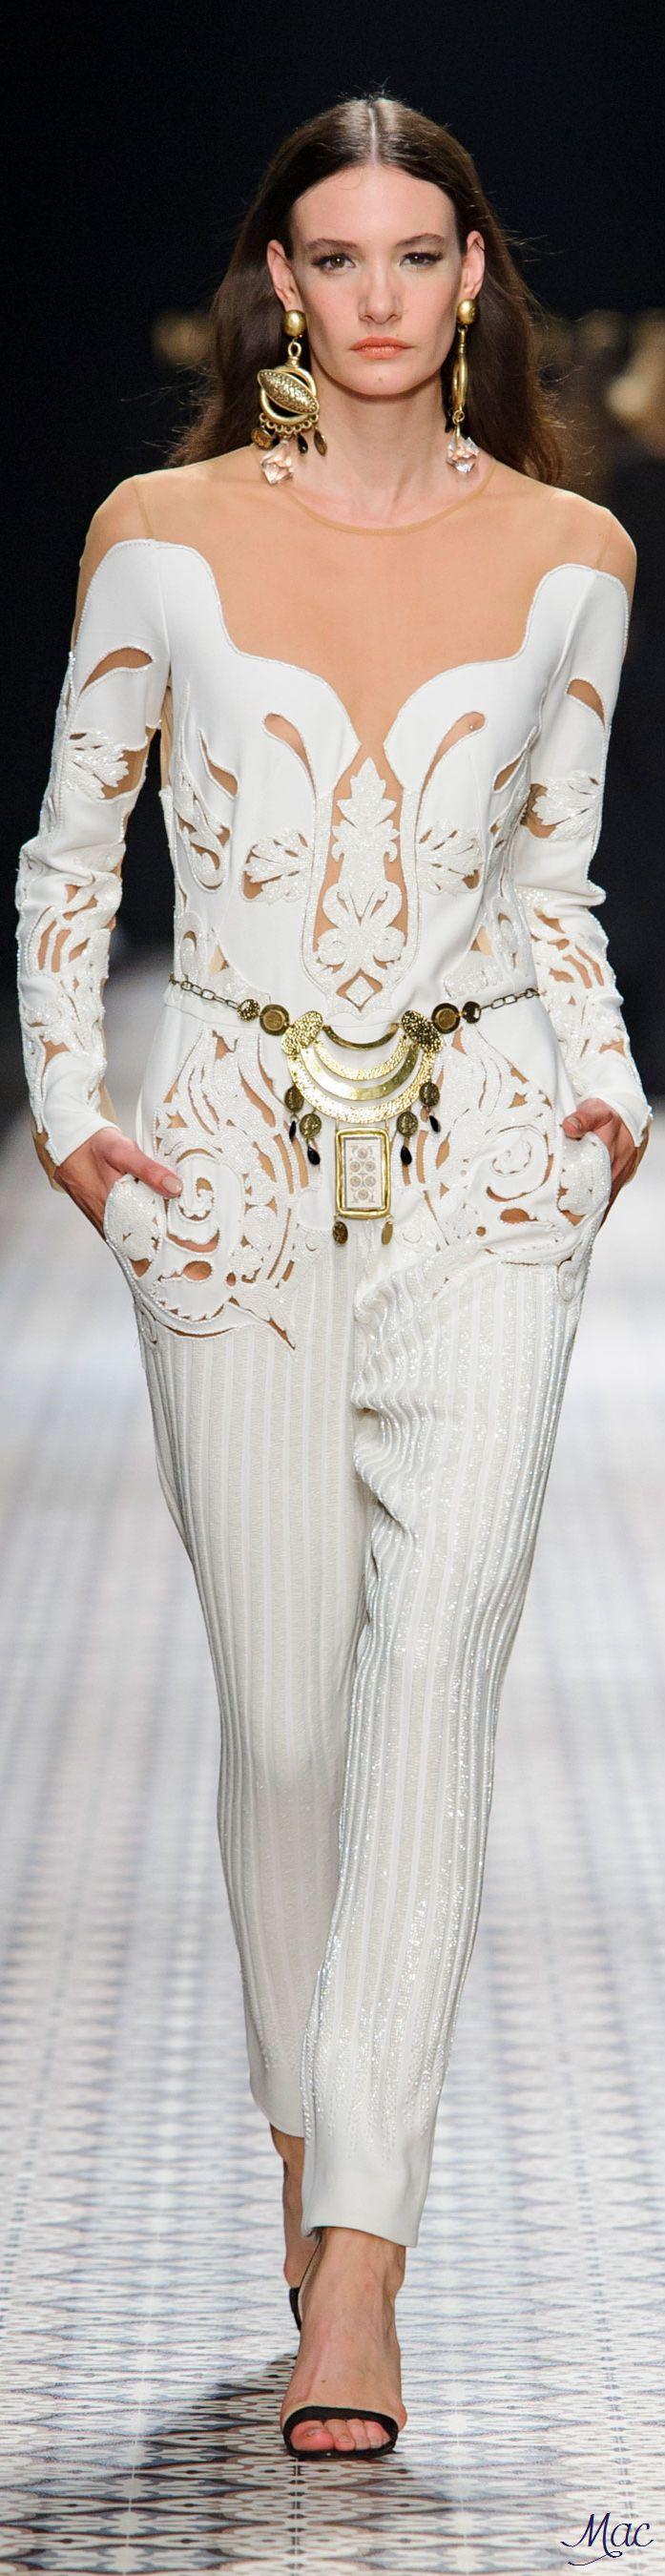 Spring 2017 Ready-to-Wear Mario Dice